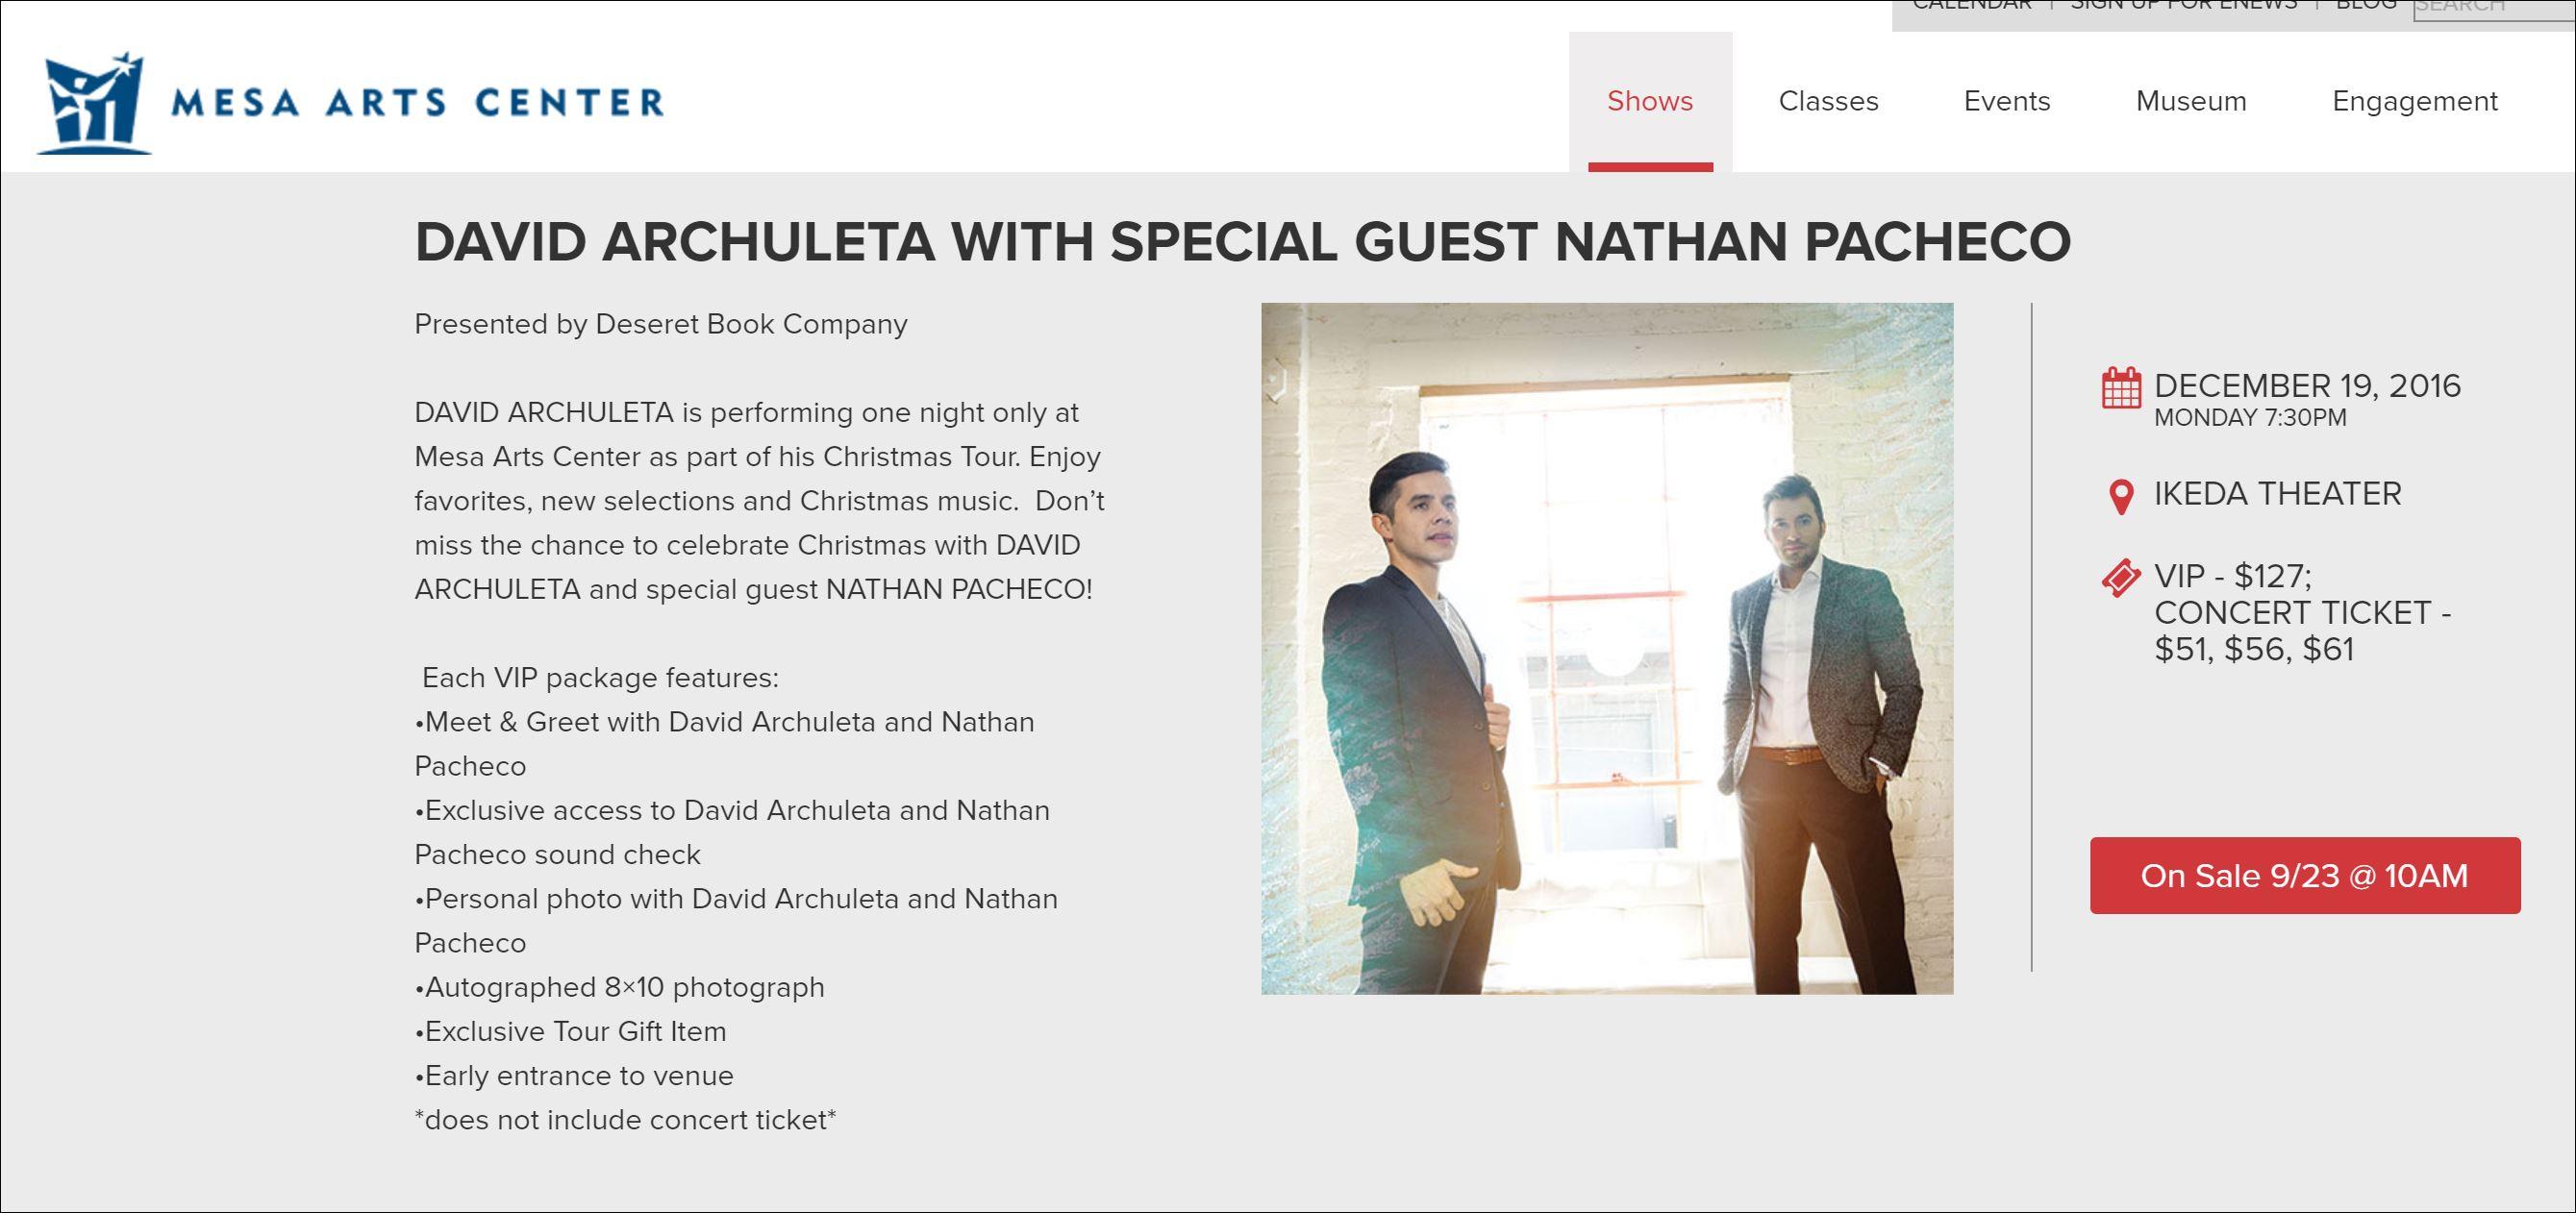 mesa-arts-david-archuleta-nathan-pacheco-announcement